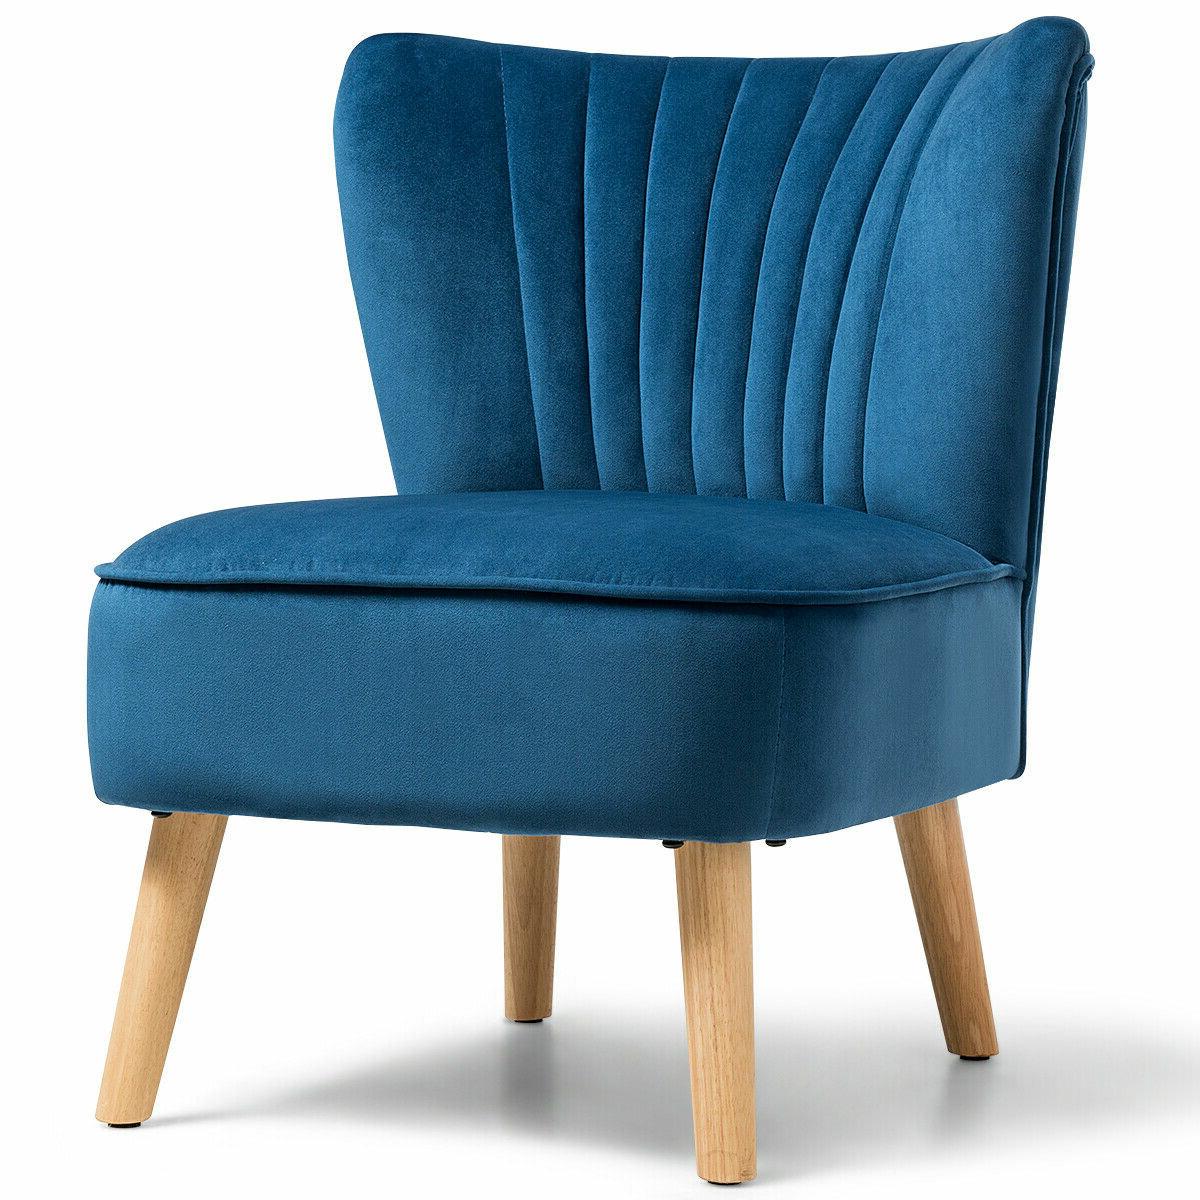 Wadhurst Slipper Chairs Intended For Popular Tintah Slipper Chair (View 10 of 20)